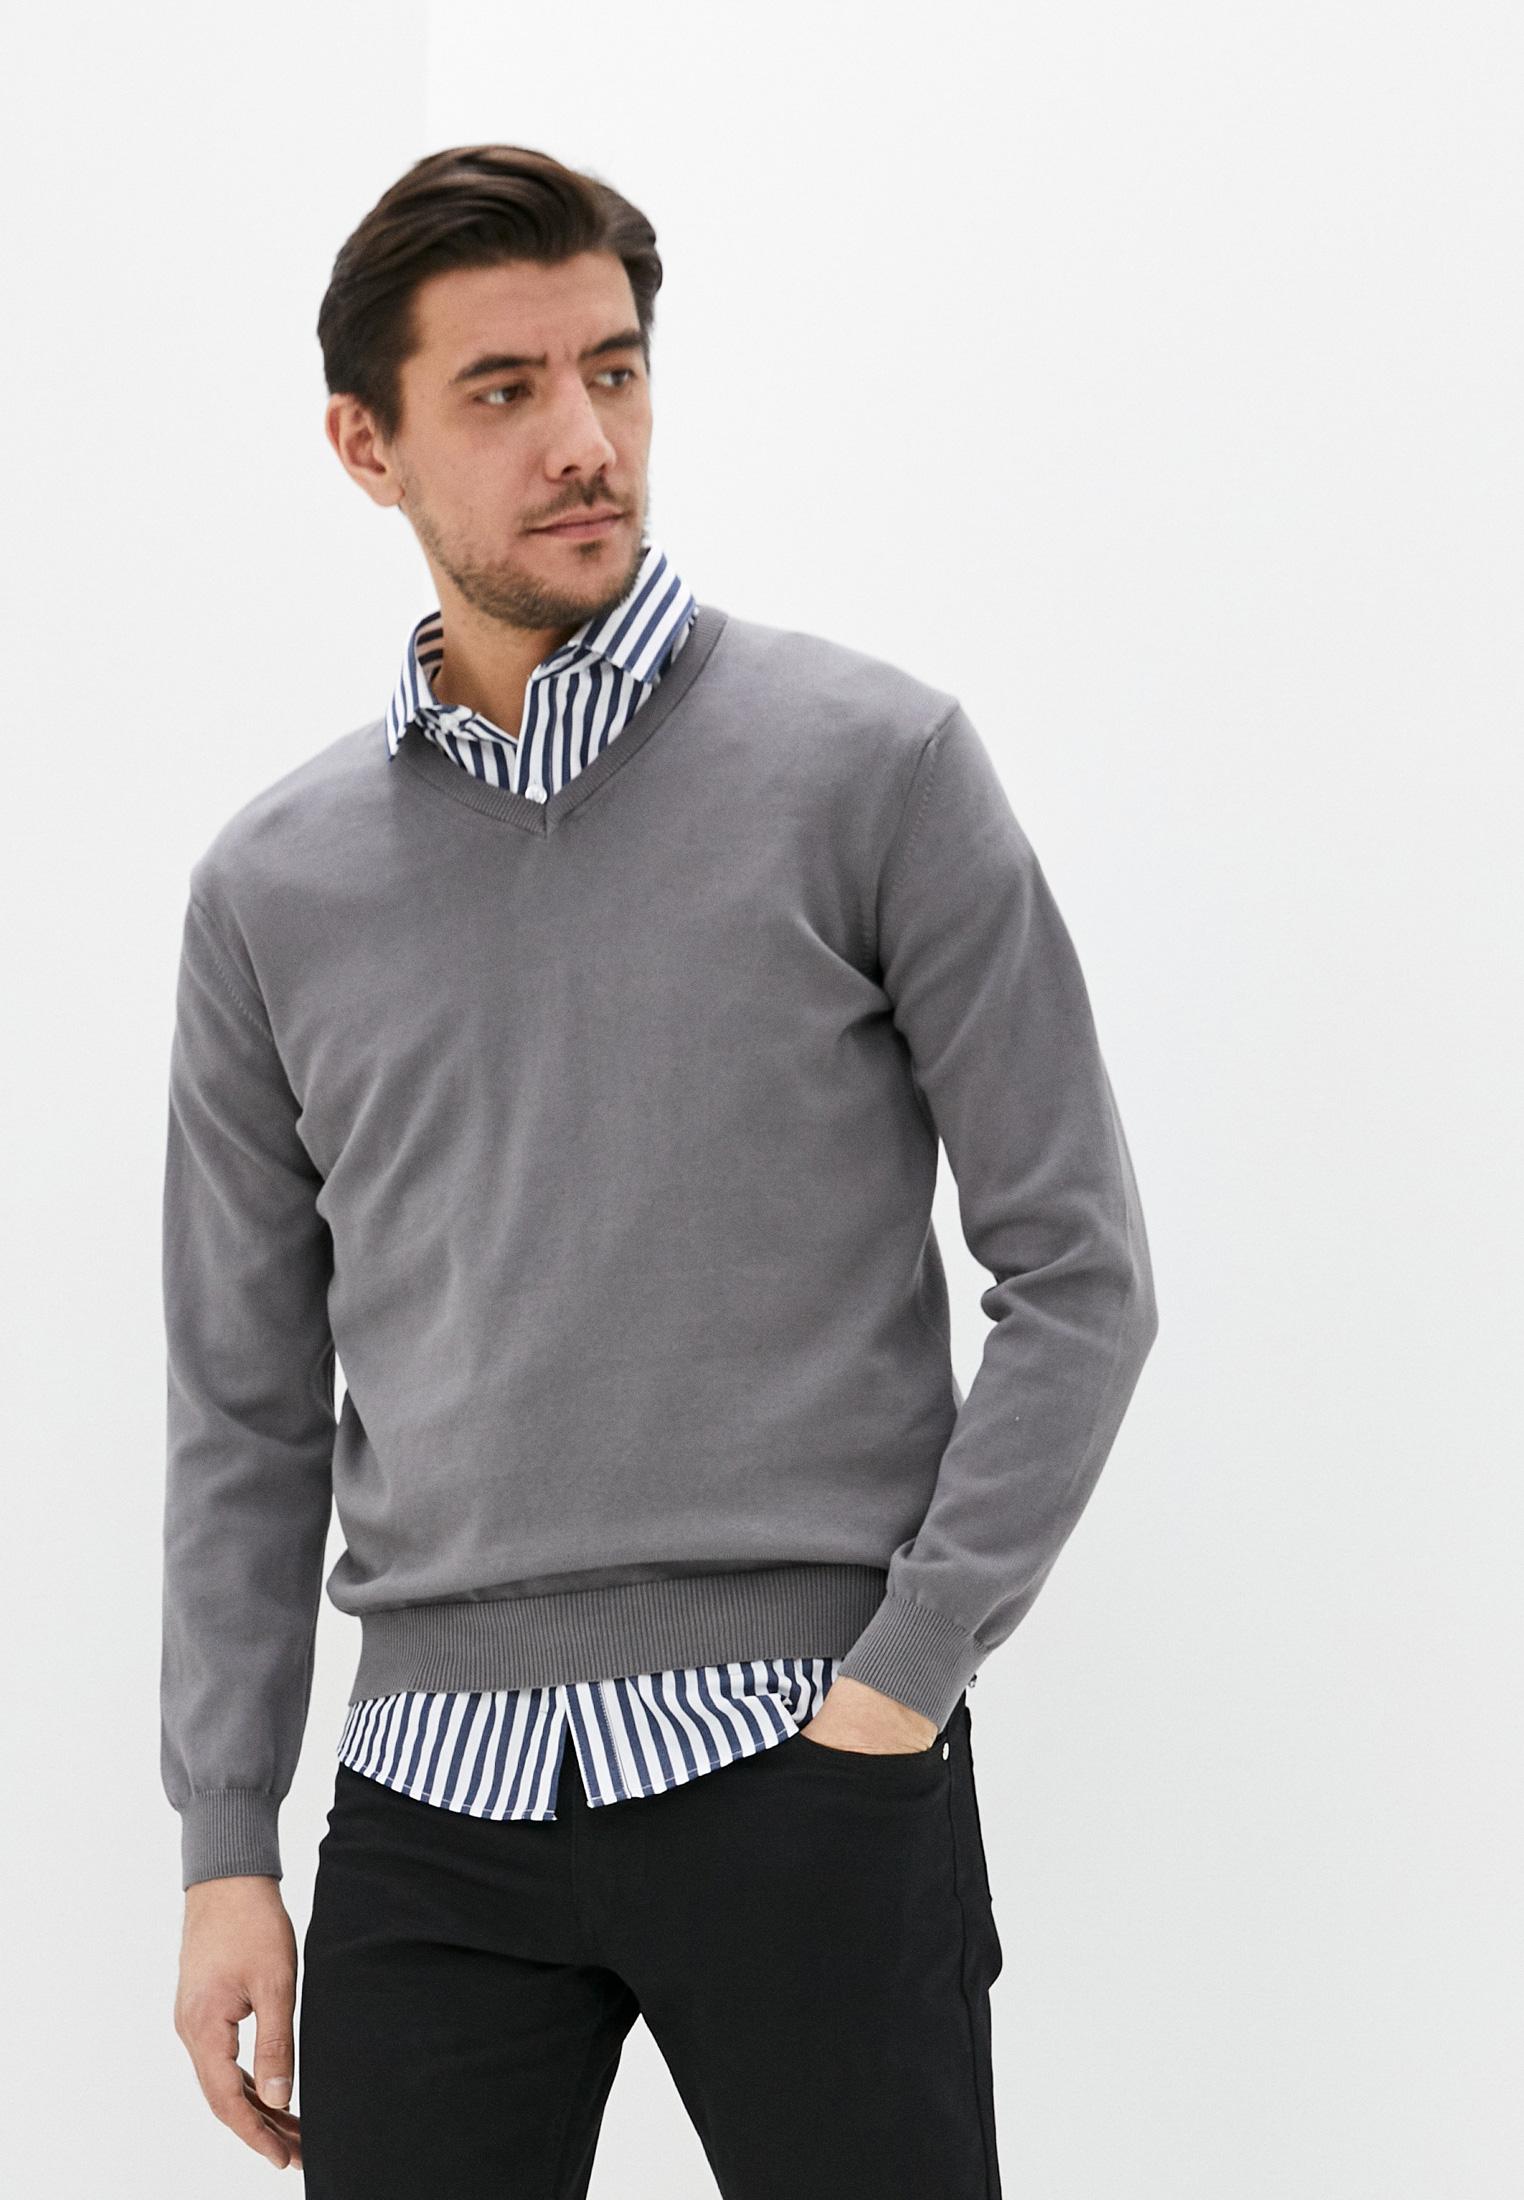 Пуловер JIMMY SANDERS (Джимми Сандерс) 19W KM5066 GREY